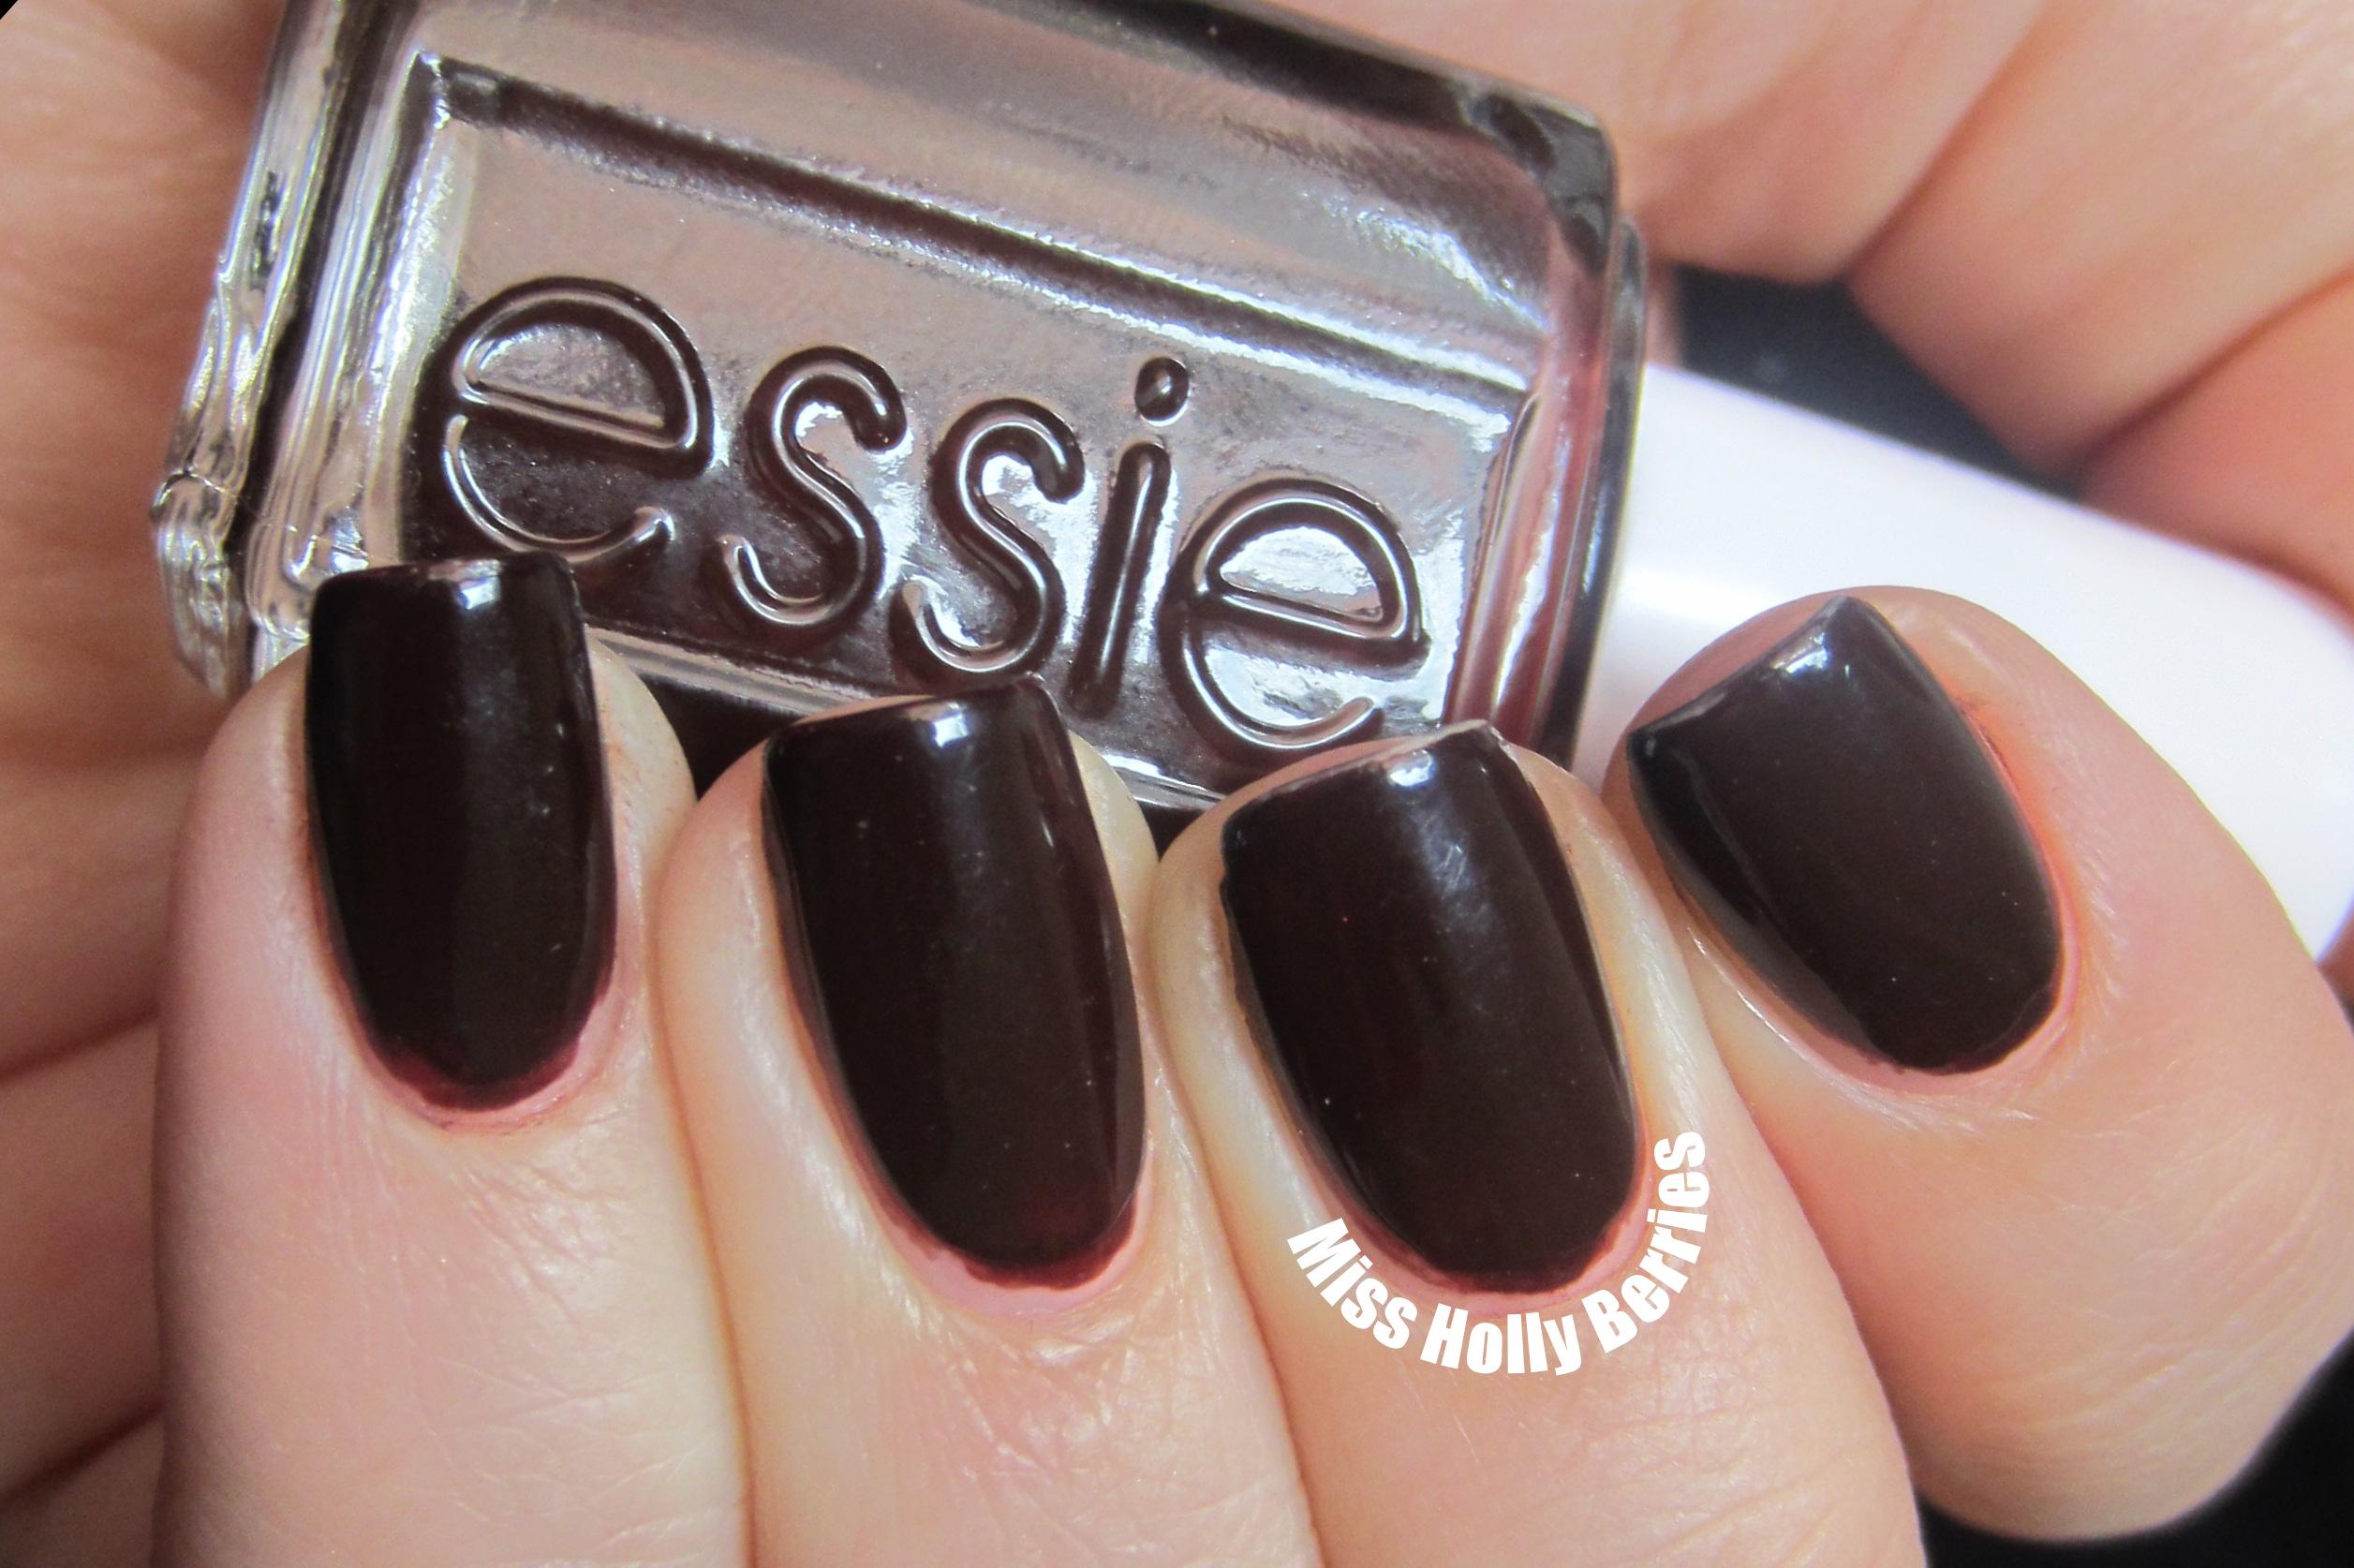 Essie lady godiva